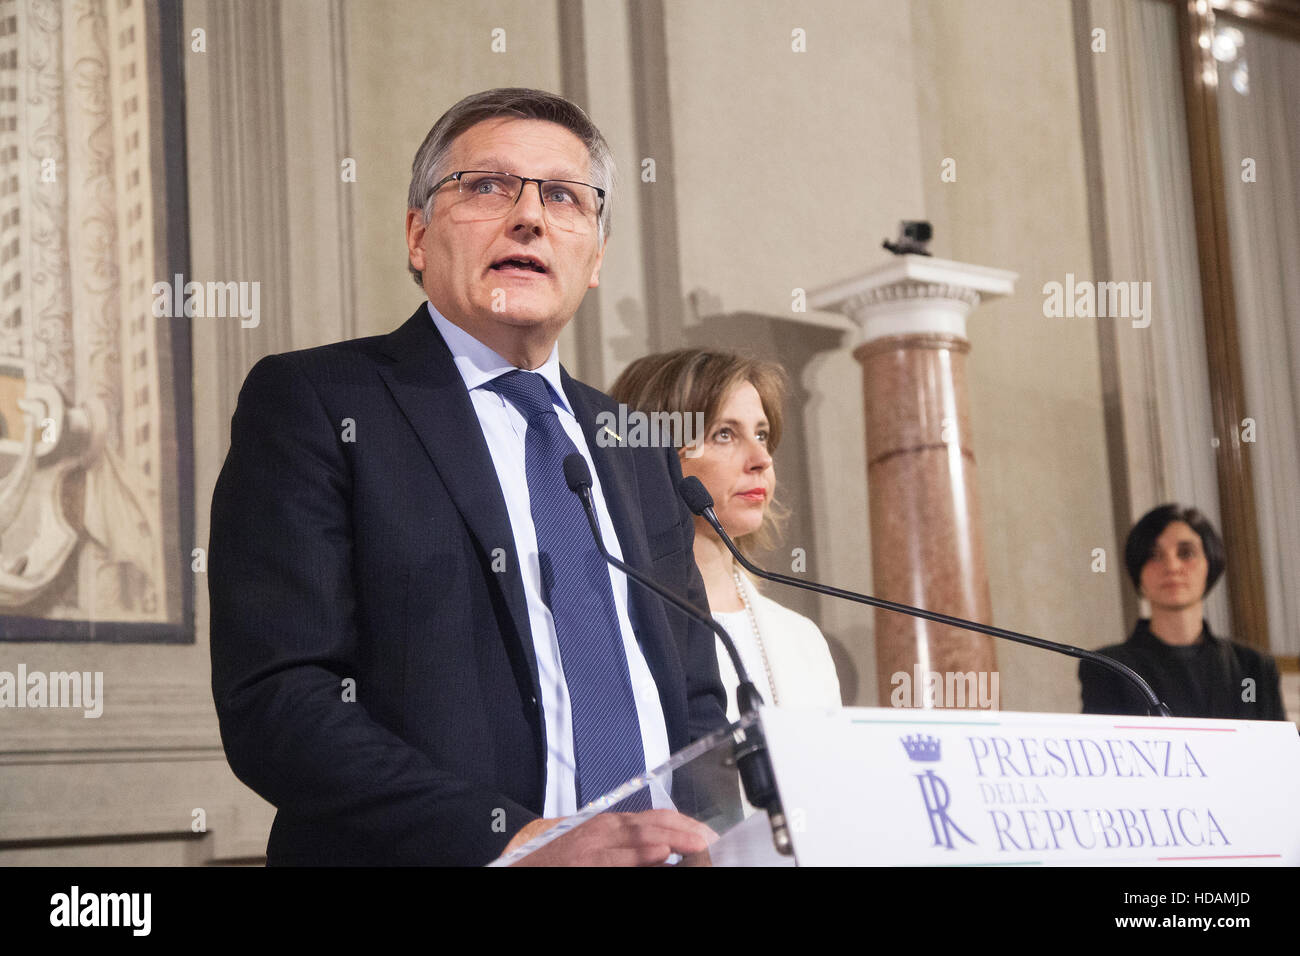 Rome, Italy. 10 December 2016.Luigi Gaetti, left, and Giulia Grillo, members of the Five Star Movement (M5S), speak - Stock Image